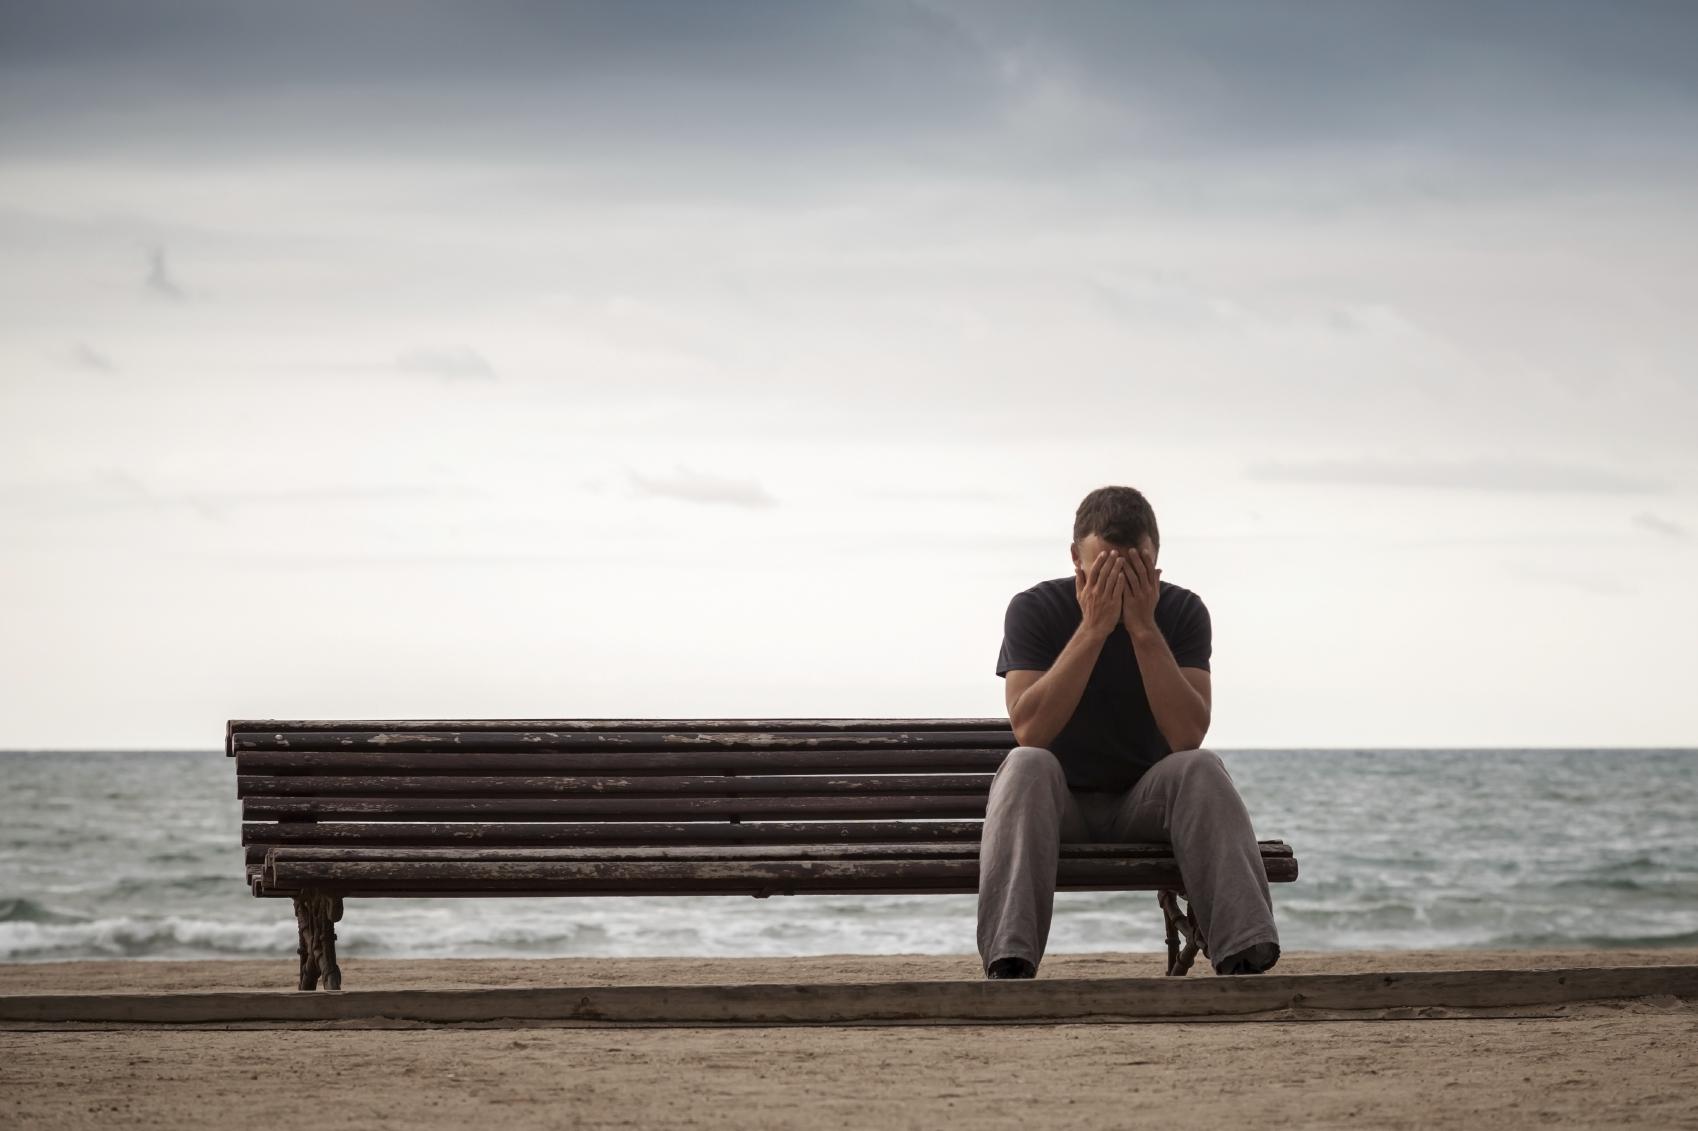 Gay people feeling lonely